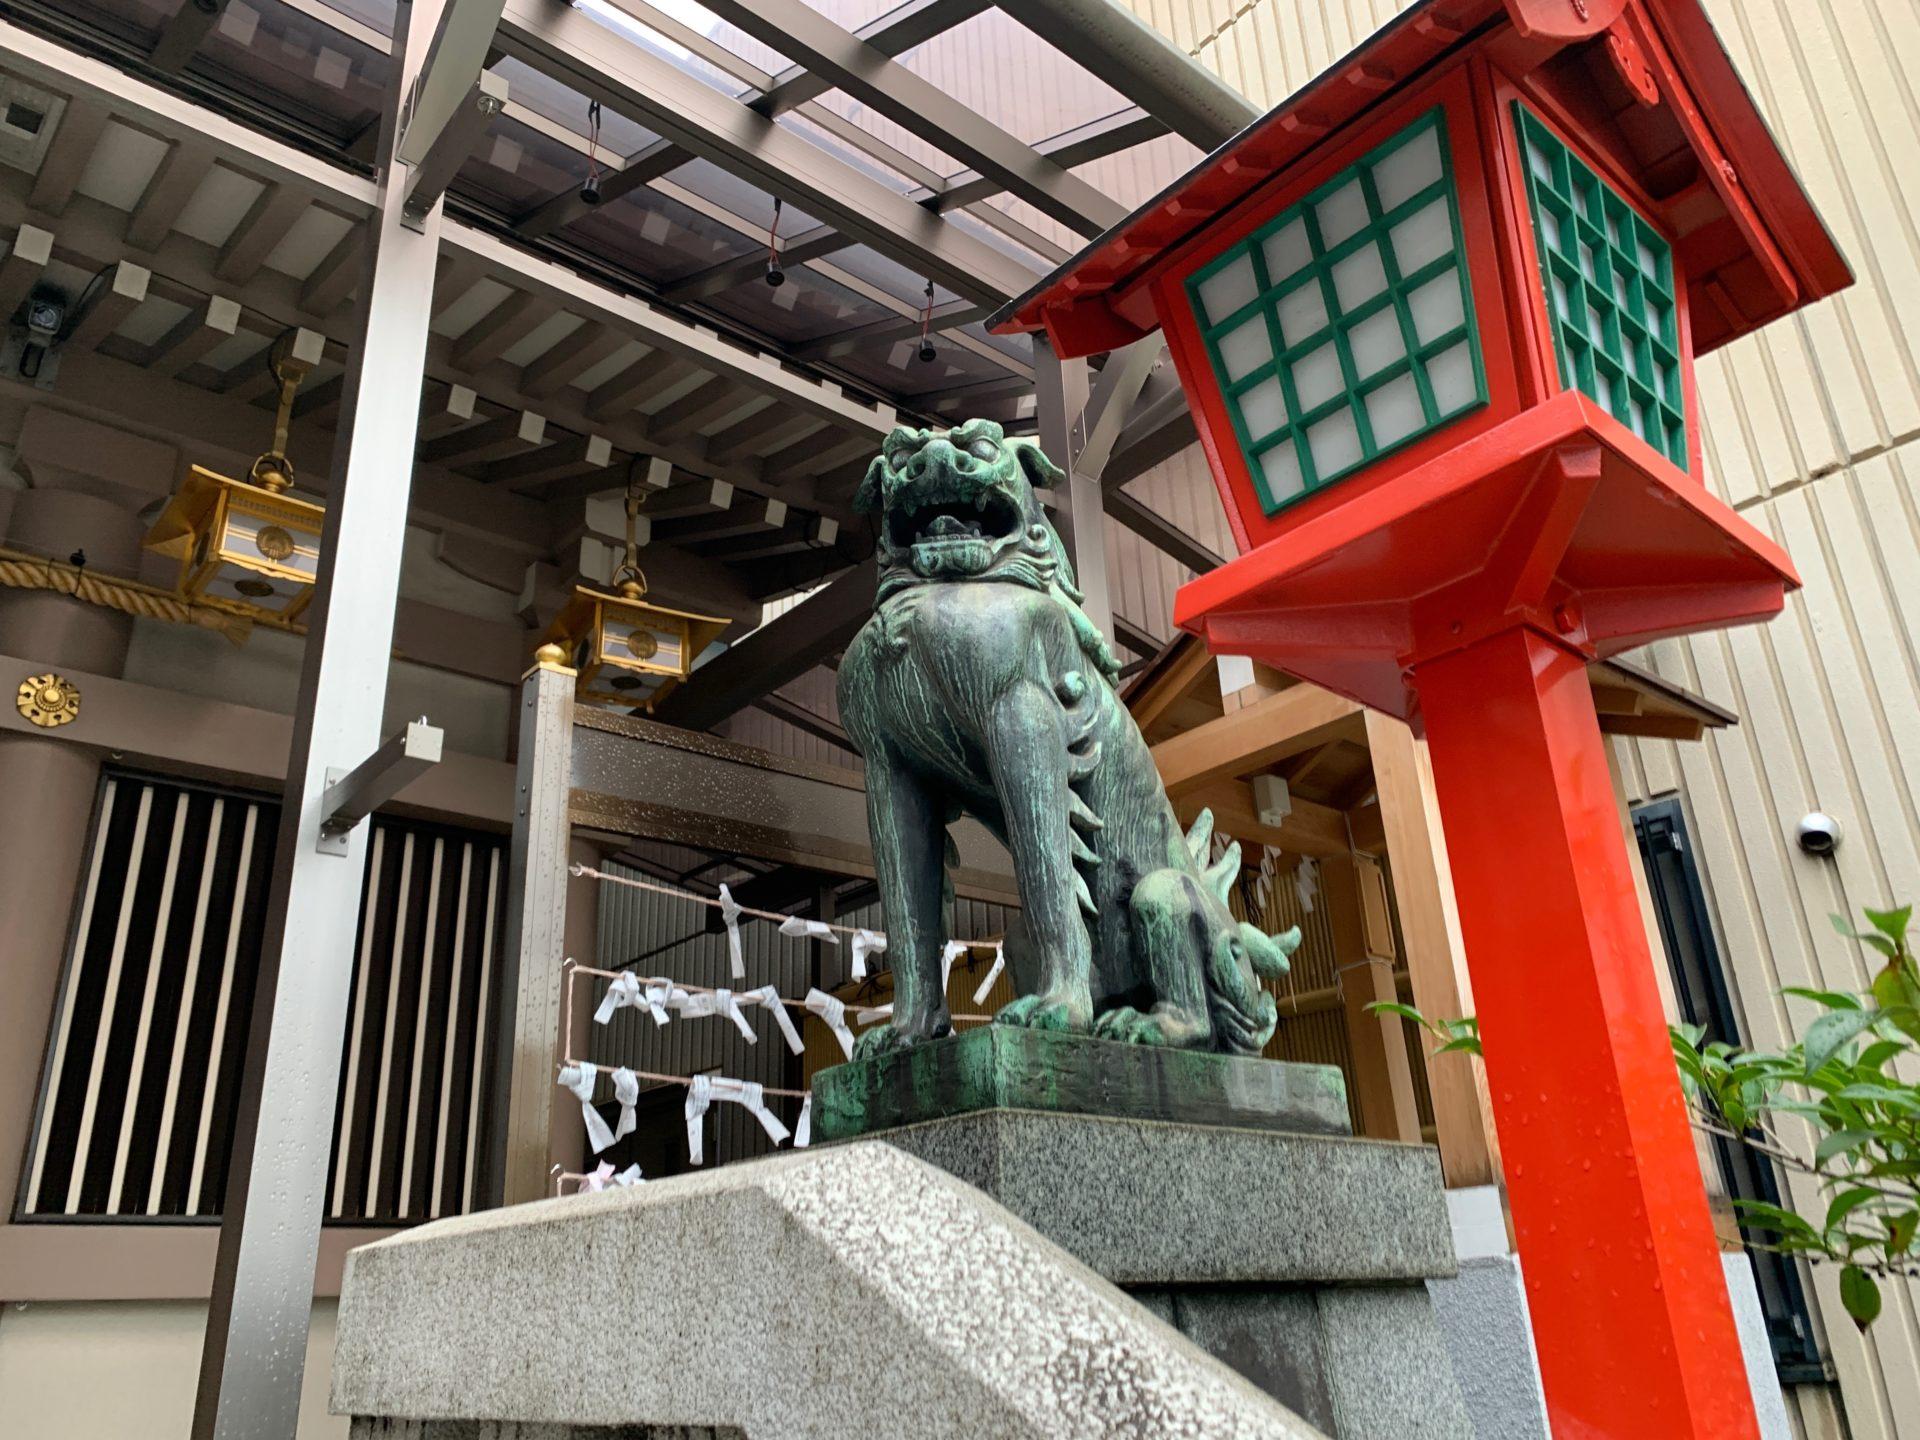 十番稲荷神社の狛犬(阿形)